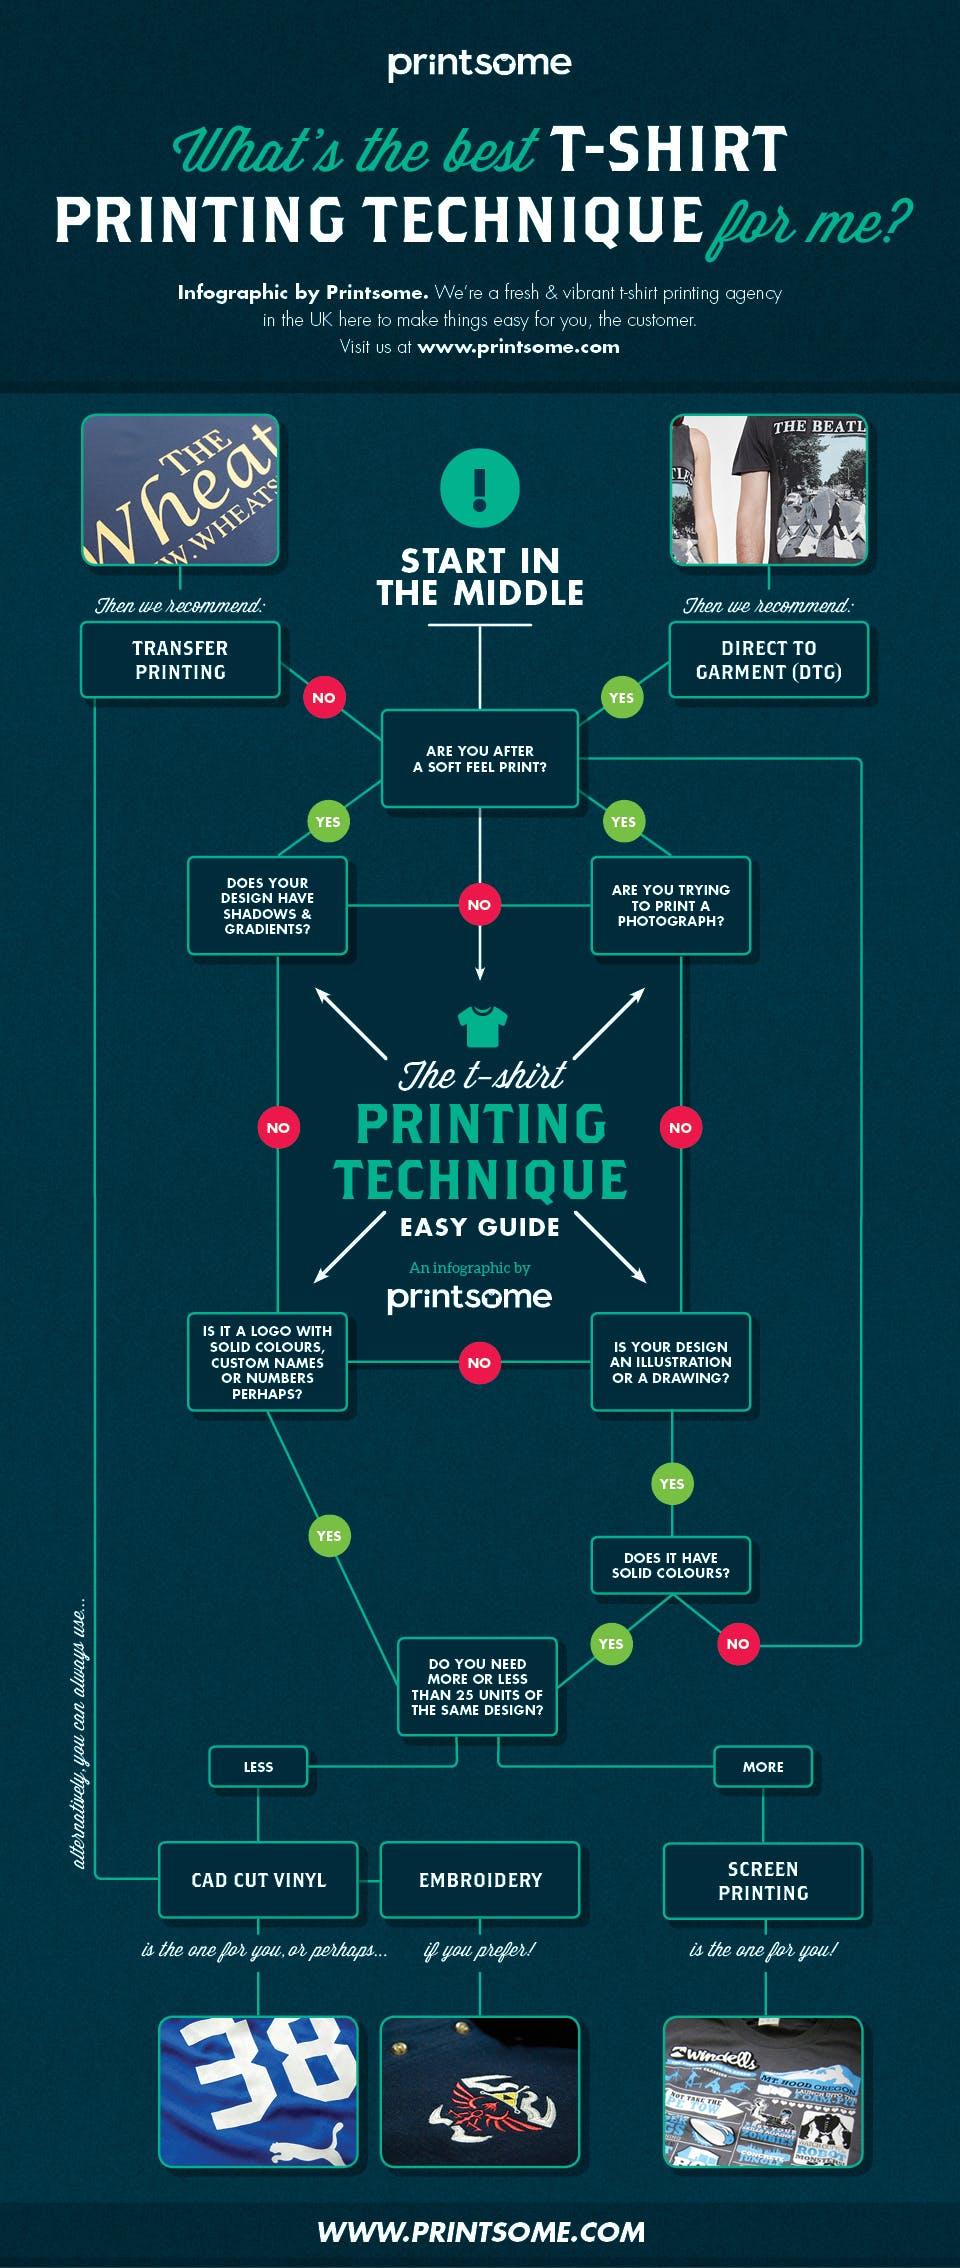 t-shirt printing techniques